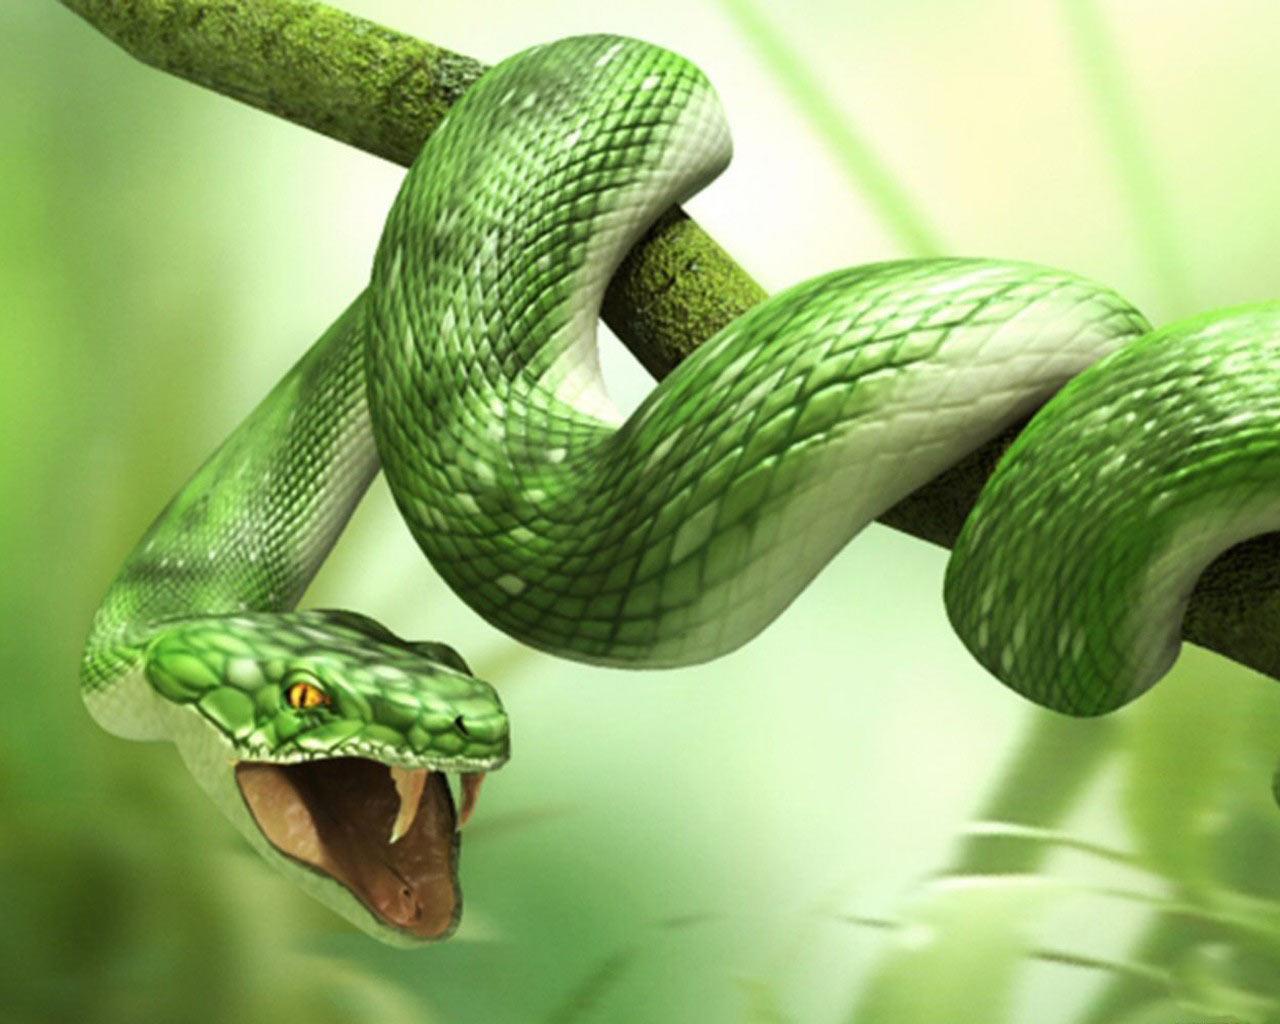 http://2.bp.blogspot.com/-QUTI9t_q2UA/TdAFFX0FpQI/AAAAAAAABlE/gltCjN8ErGk/s1600/3d_animals_-_Snake-wallpapers.jpg